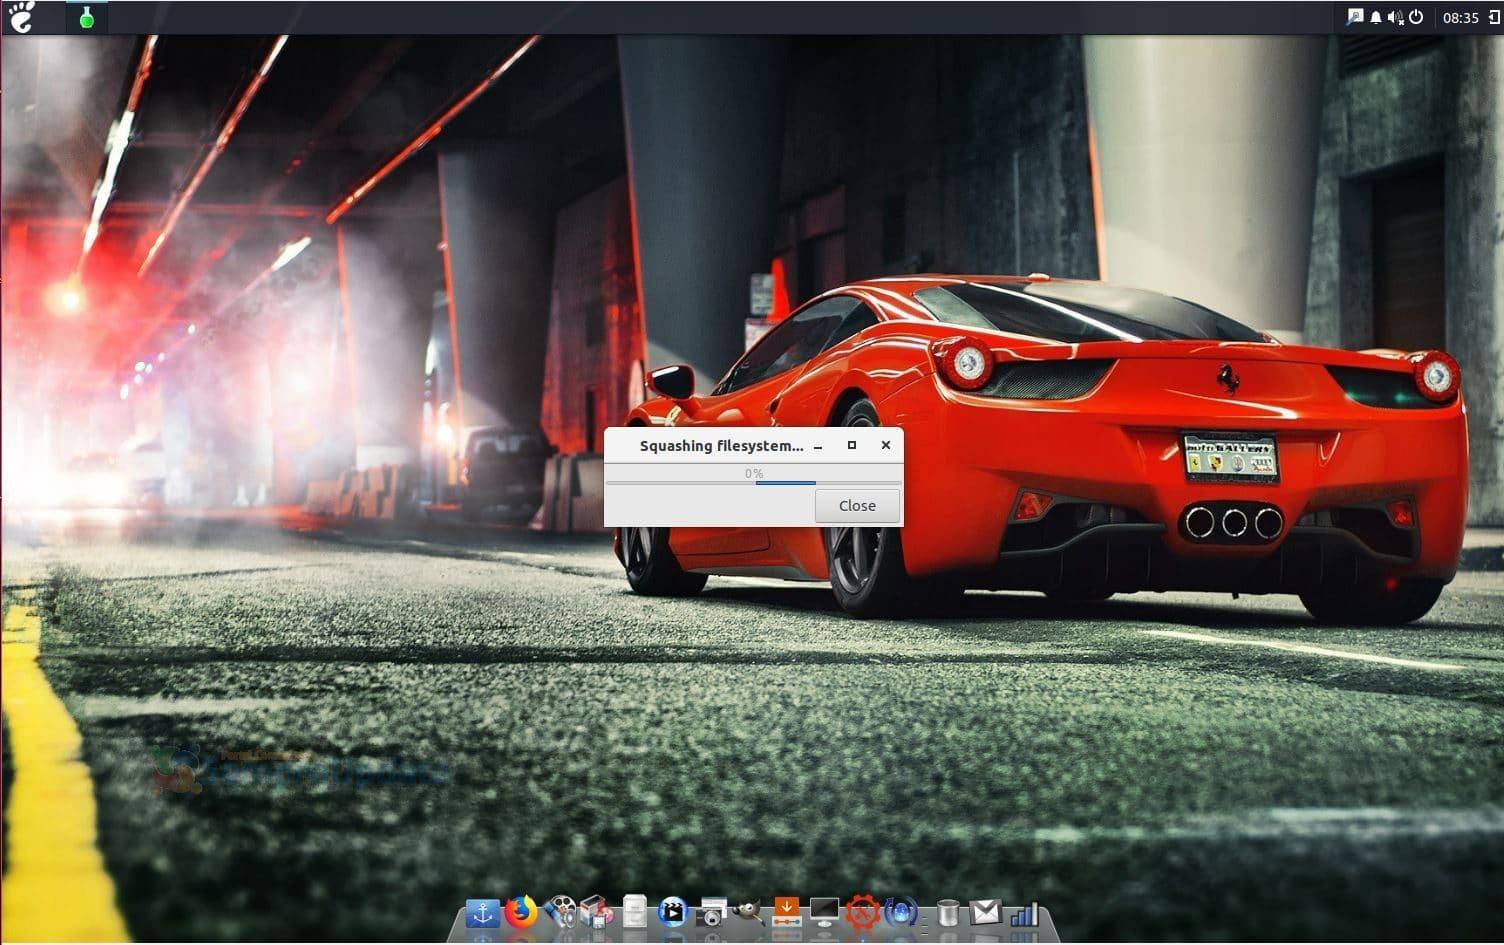 Exton Os Desktop Refracta Snapshot Running 180301